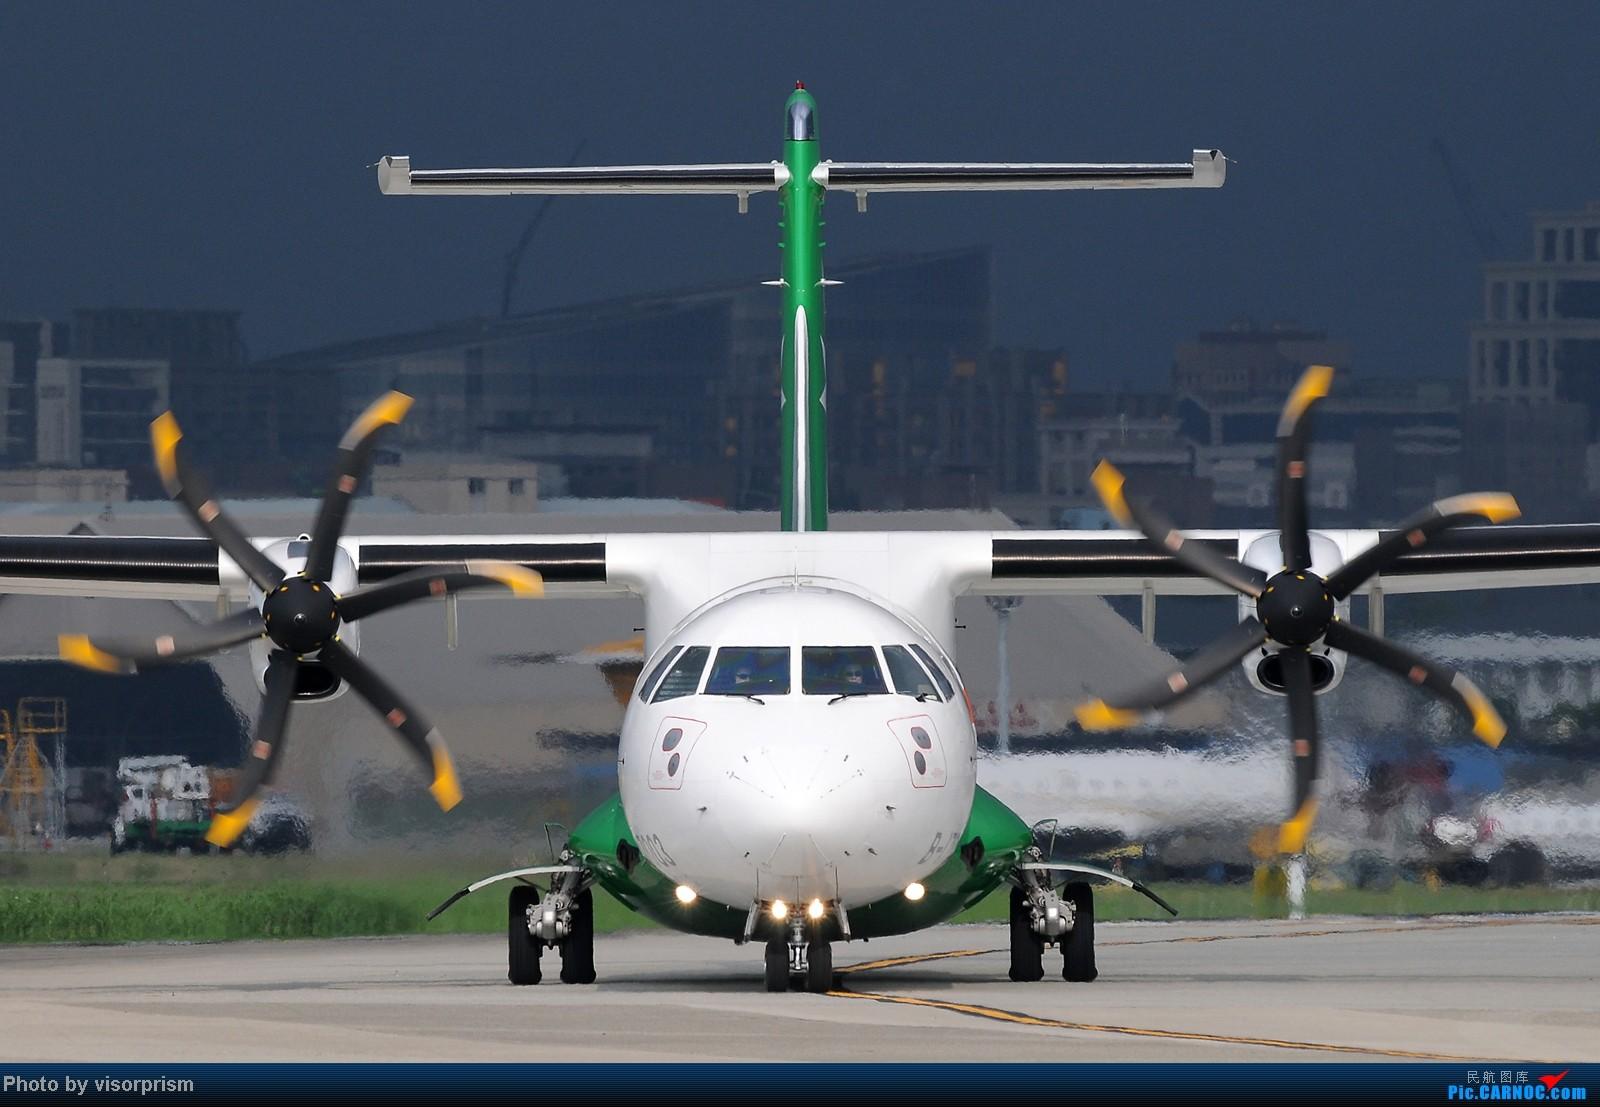 Re:[原创][台北飛友會]SIGMA APO 500mm F4.5 DG HSM 鏡頭測試 ATR-72 B-17003 中国台北松山机场